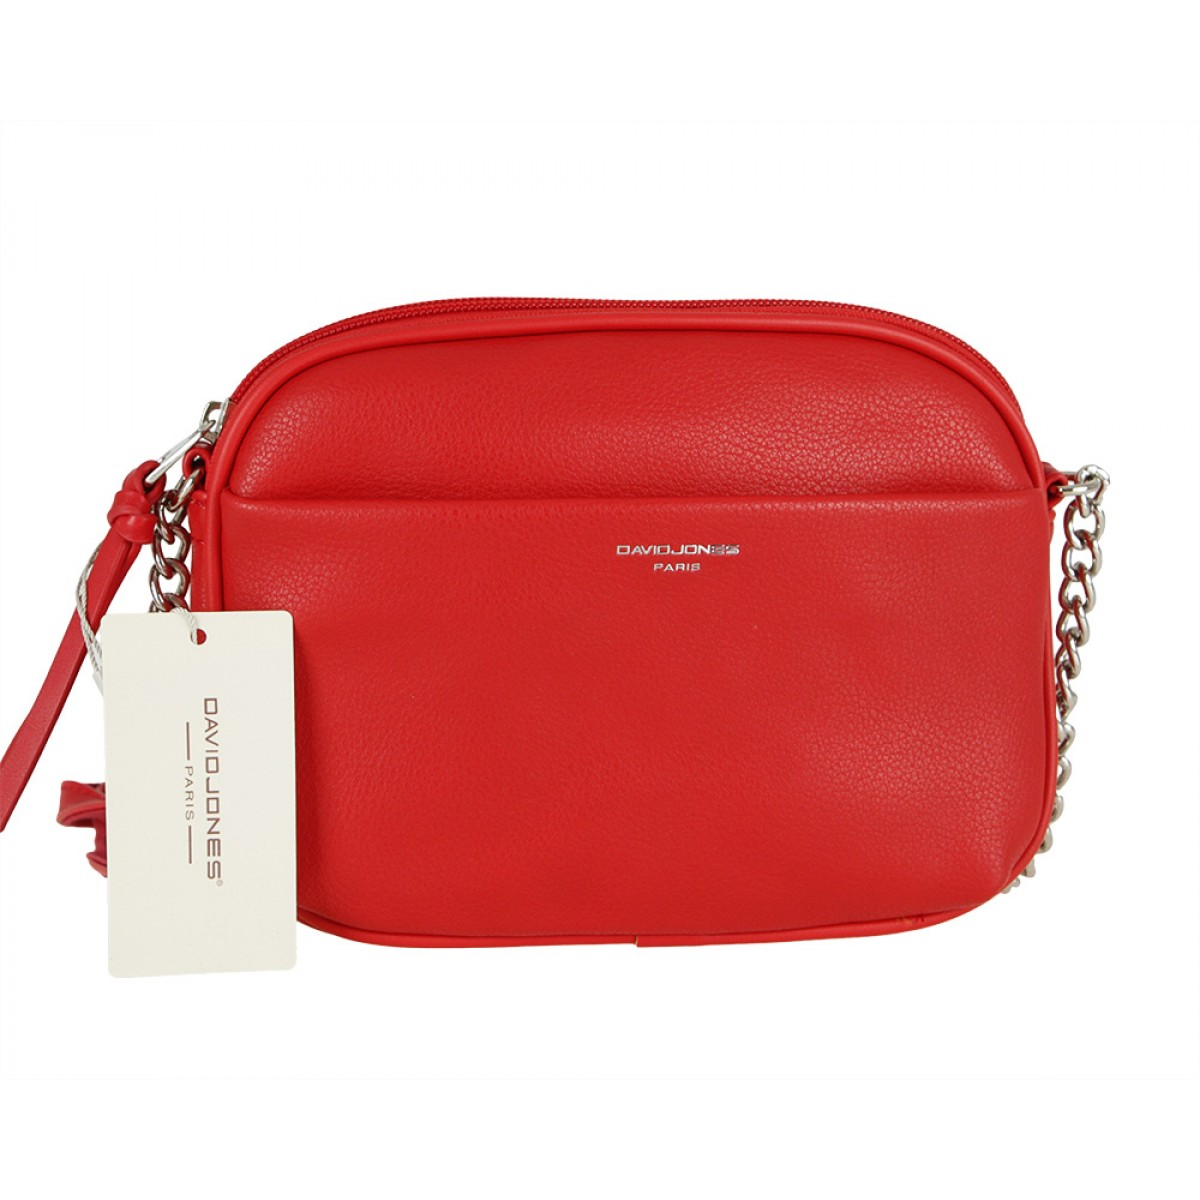 Жіноча сумка David Jones 6129-1 RED